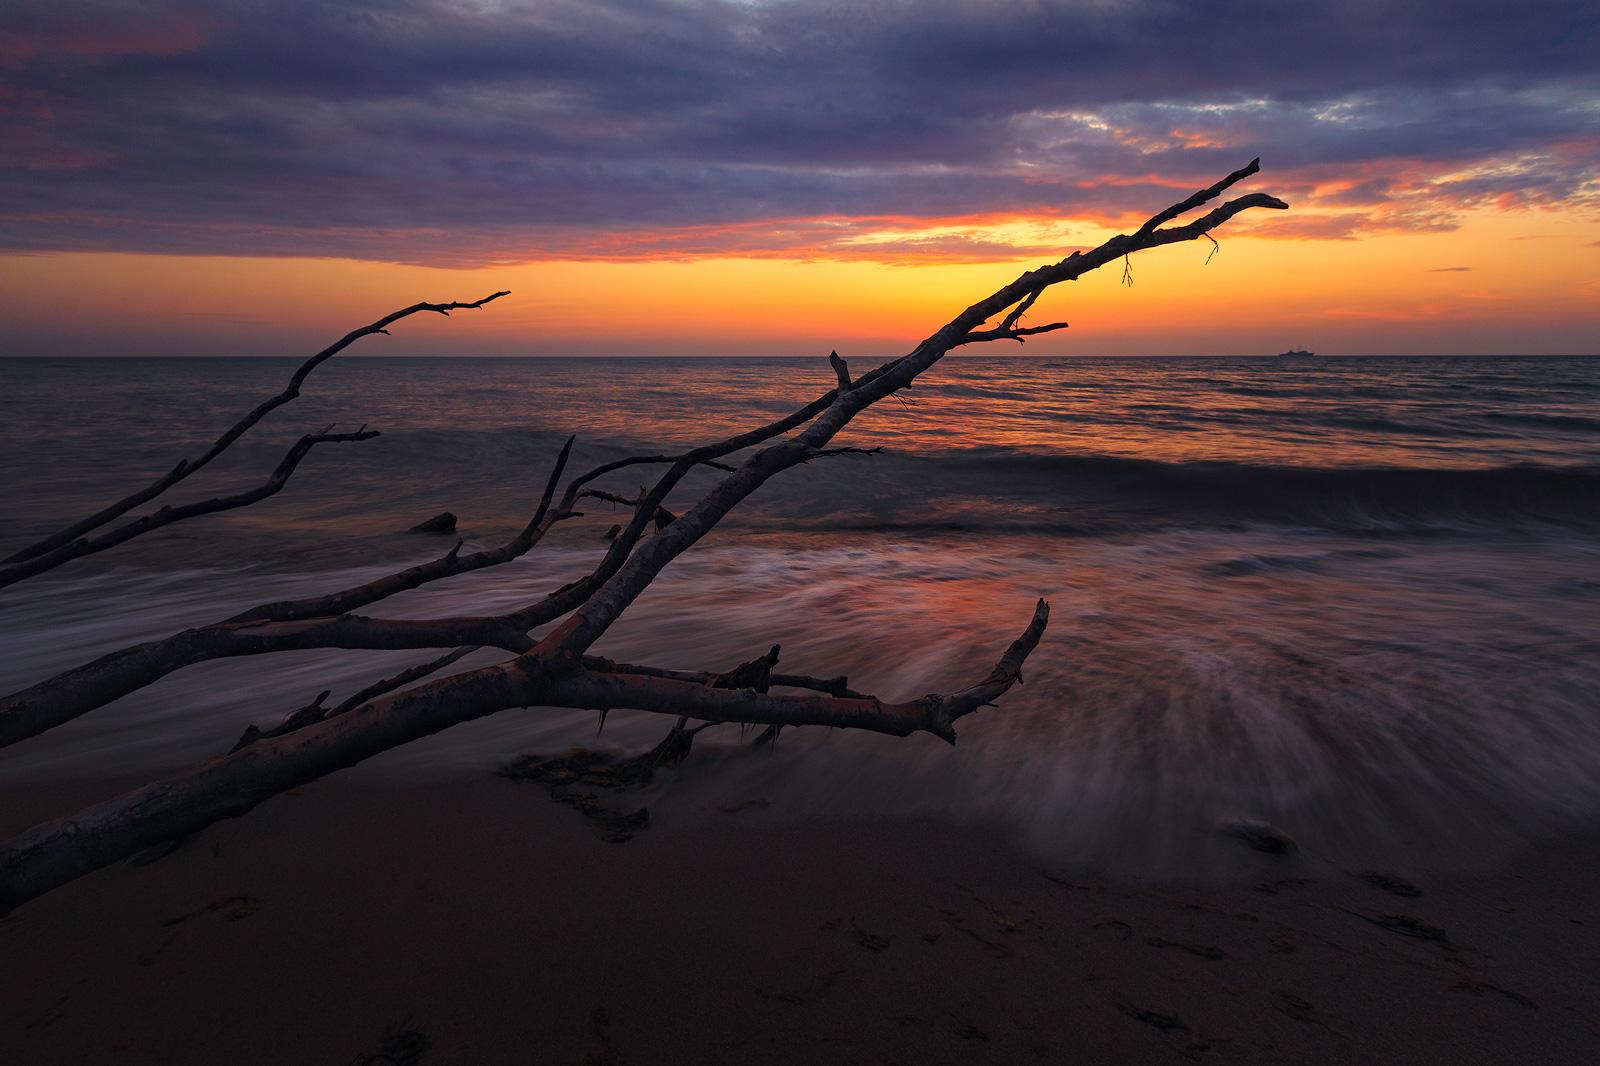 Sonnenuntergang am Weststrand, Ostsee, Zingst, Darß